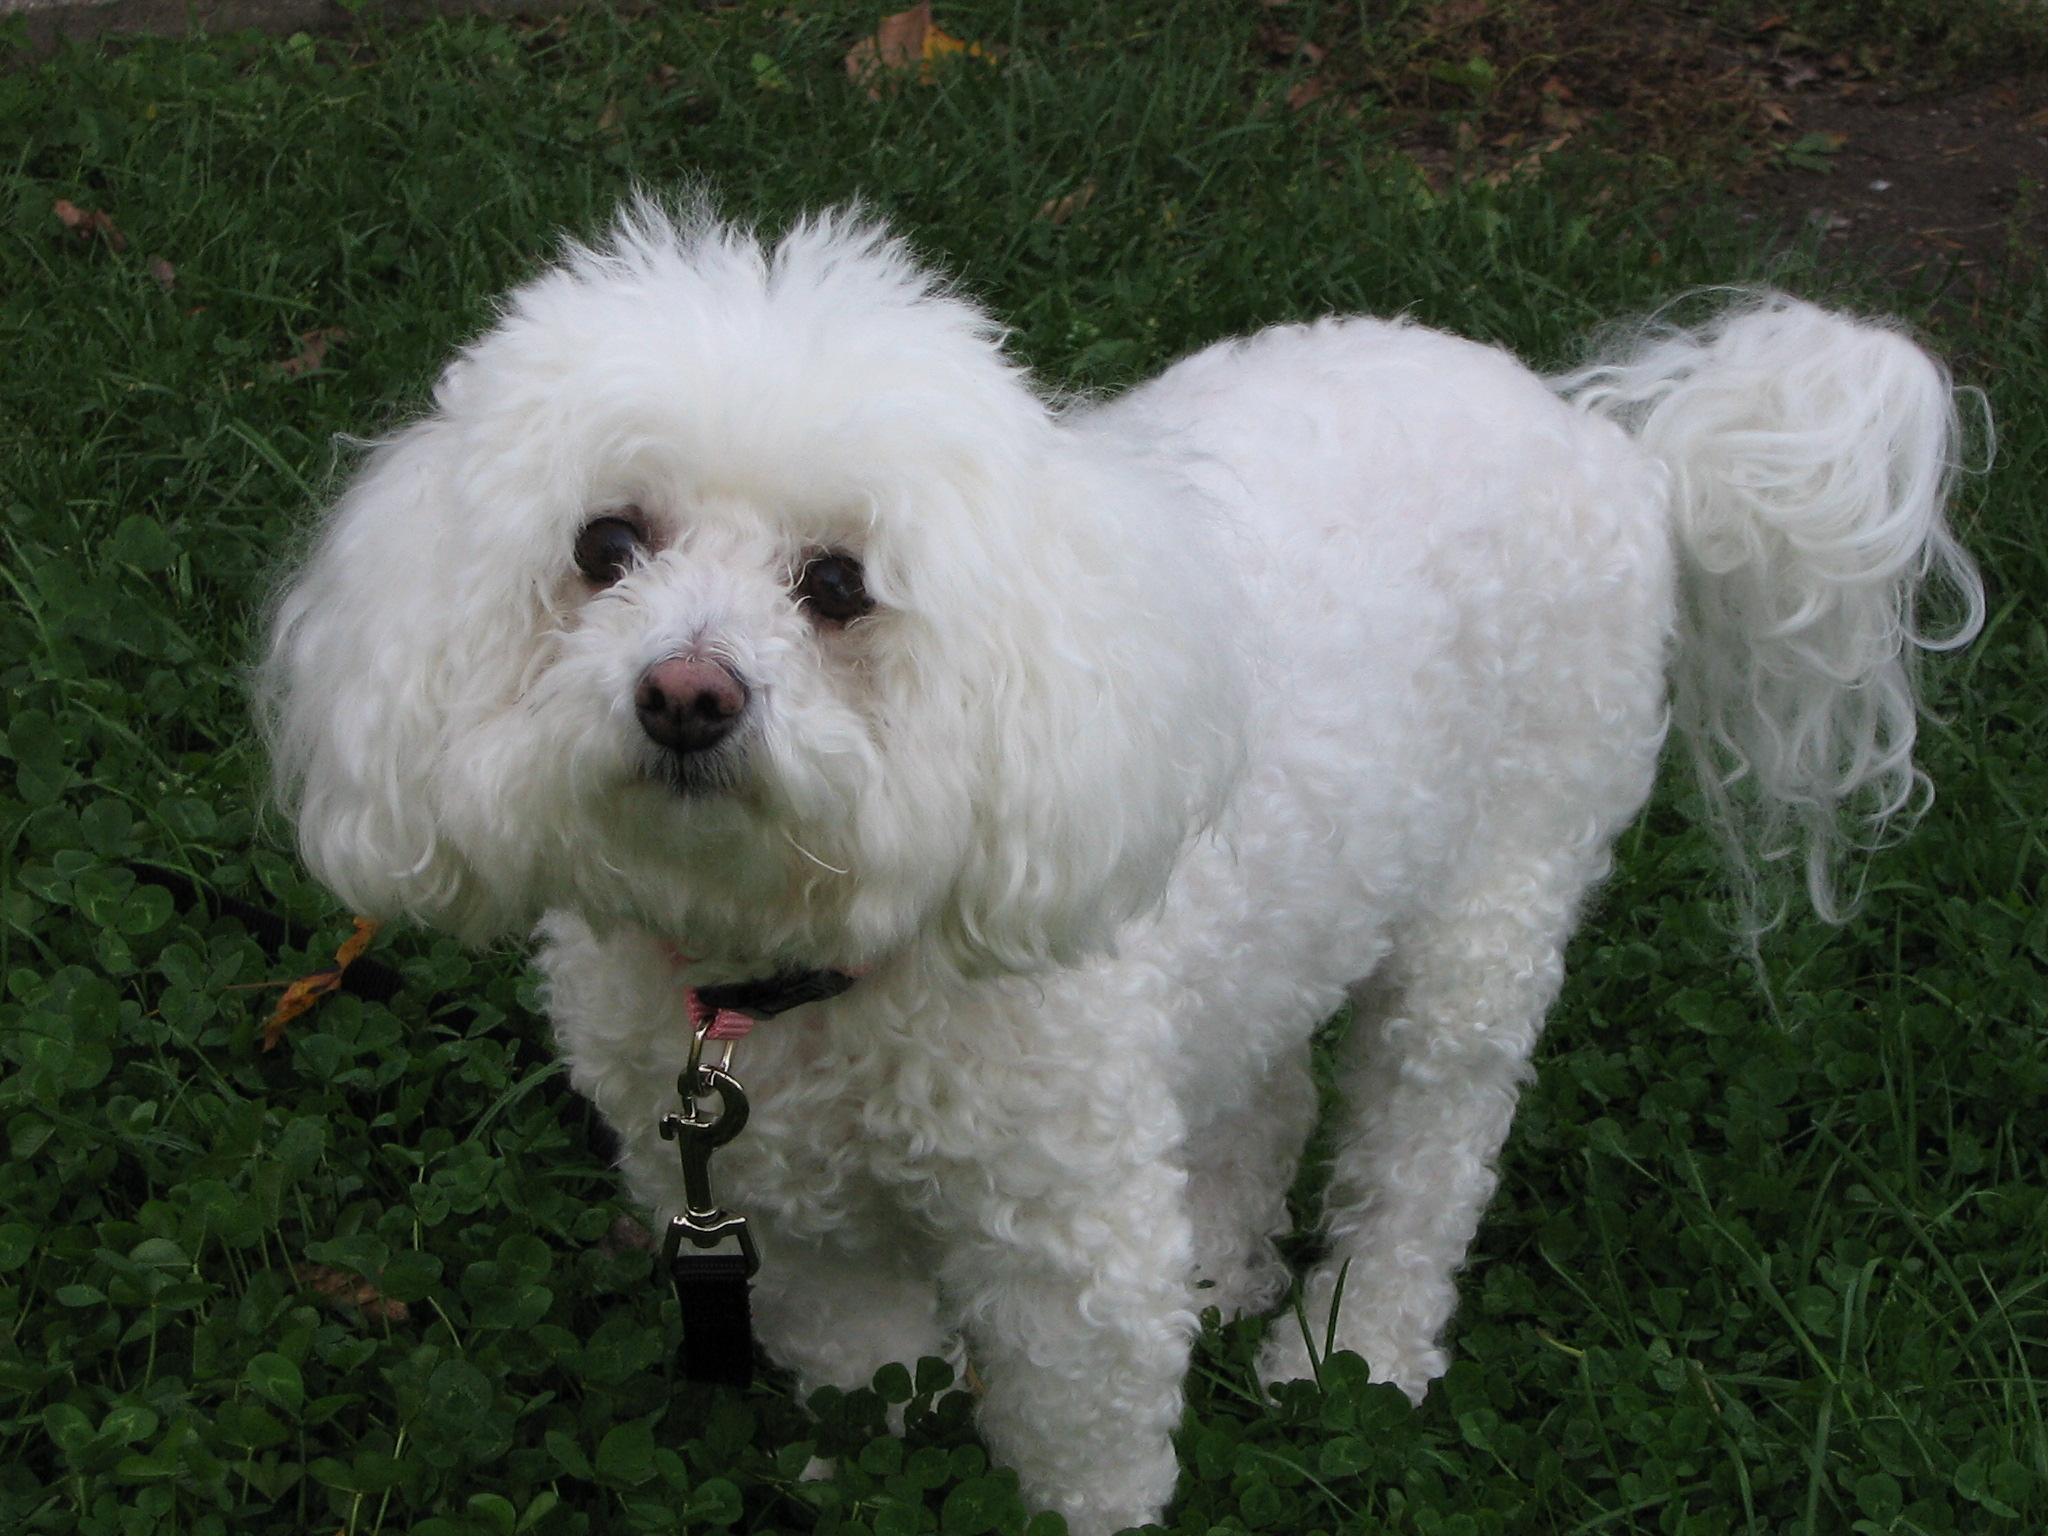 Bichon Frise - Small Dog Breeds